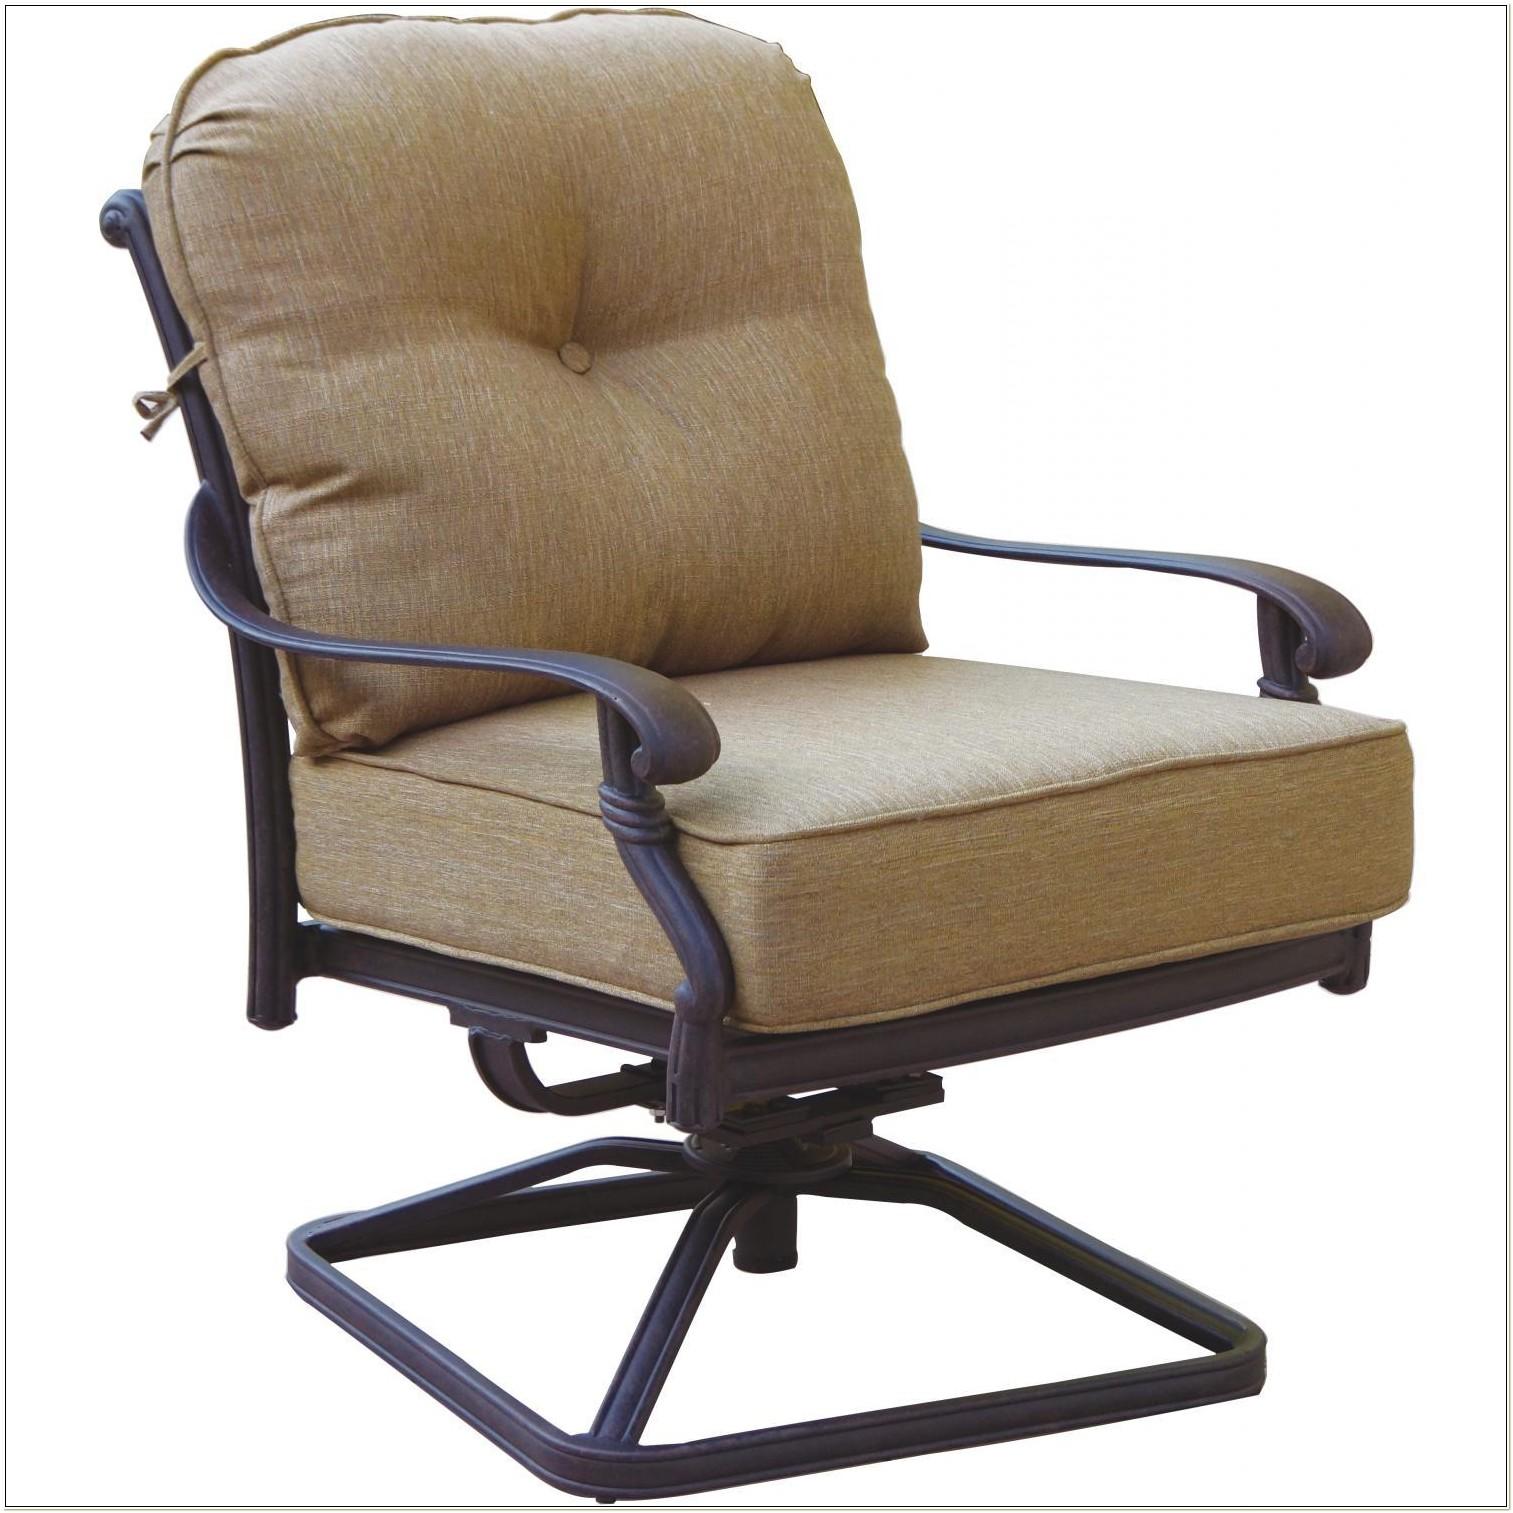 Patio Furniture Swivel Rockers